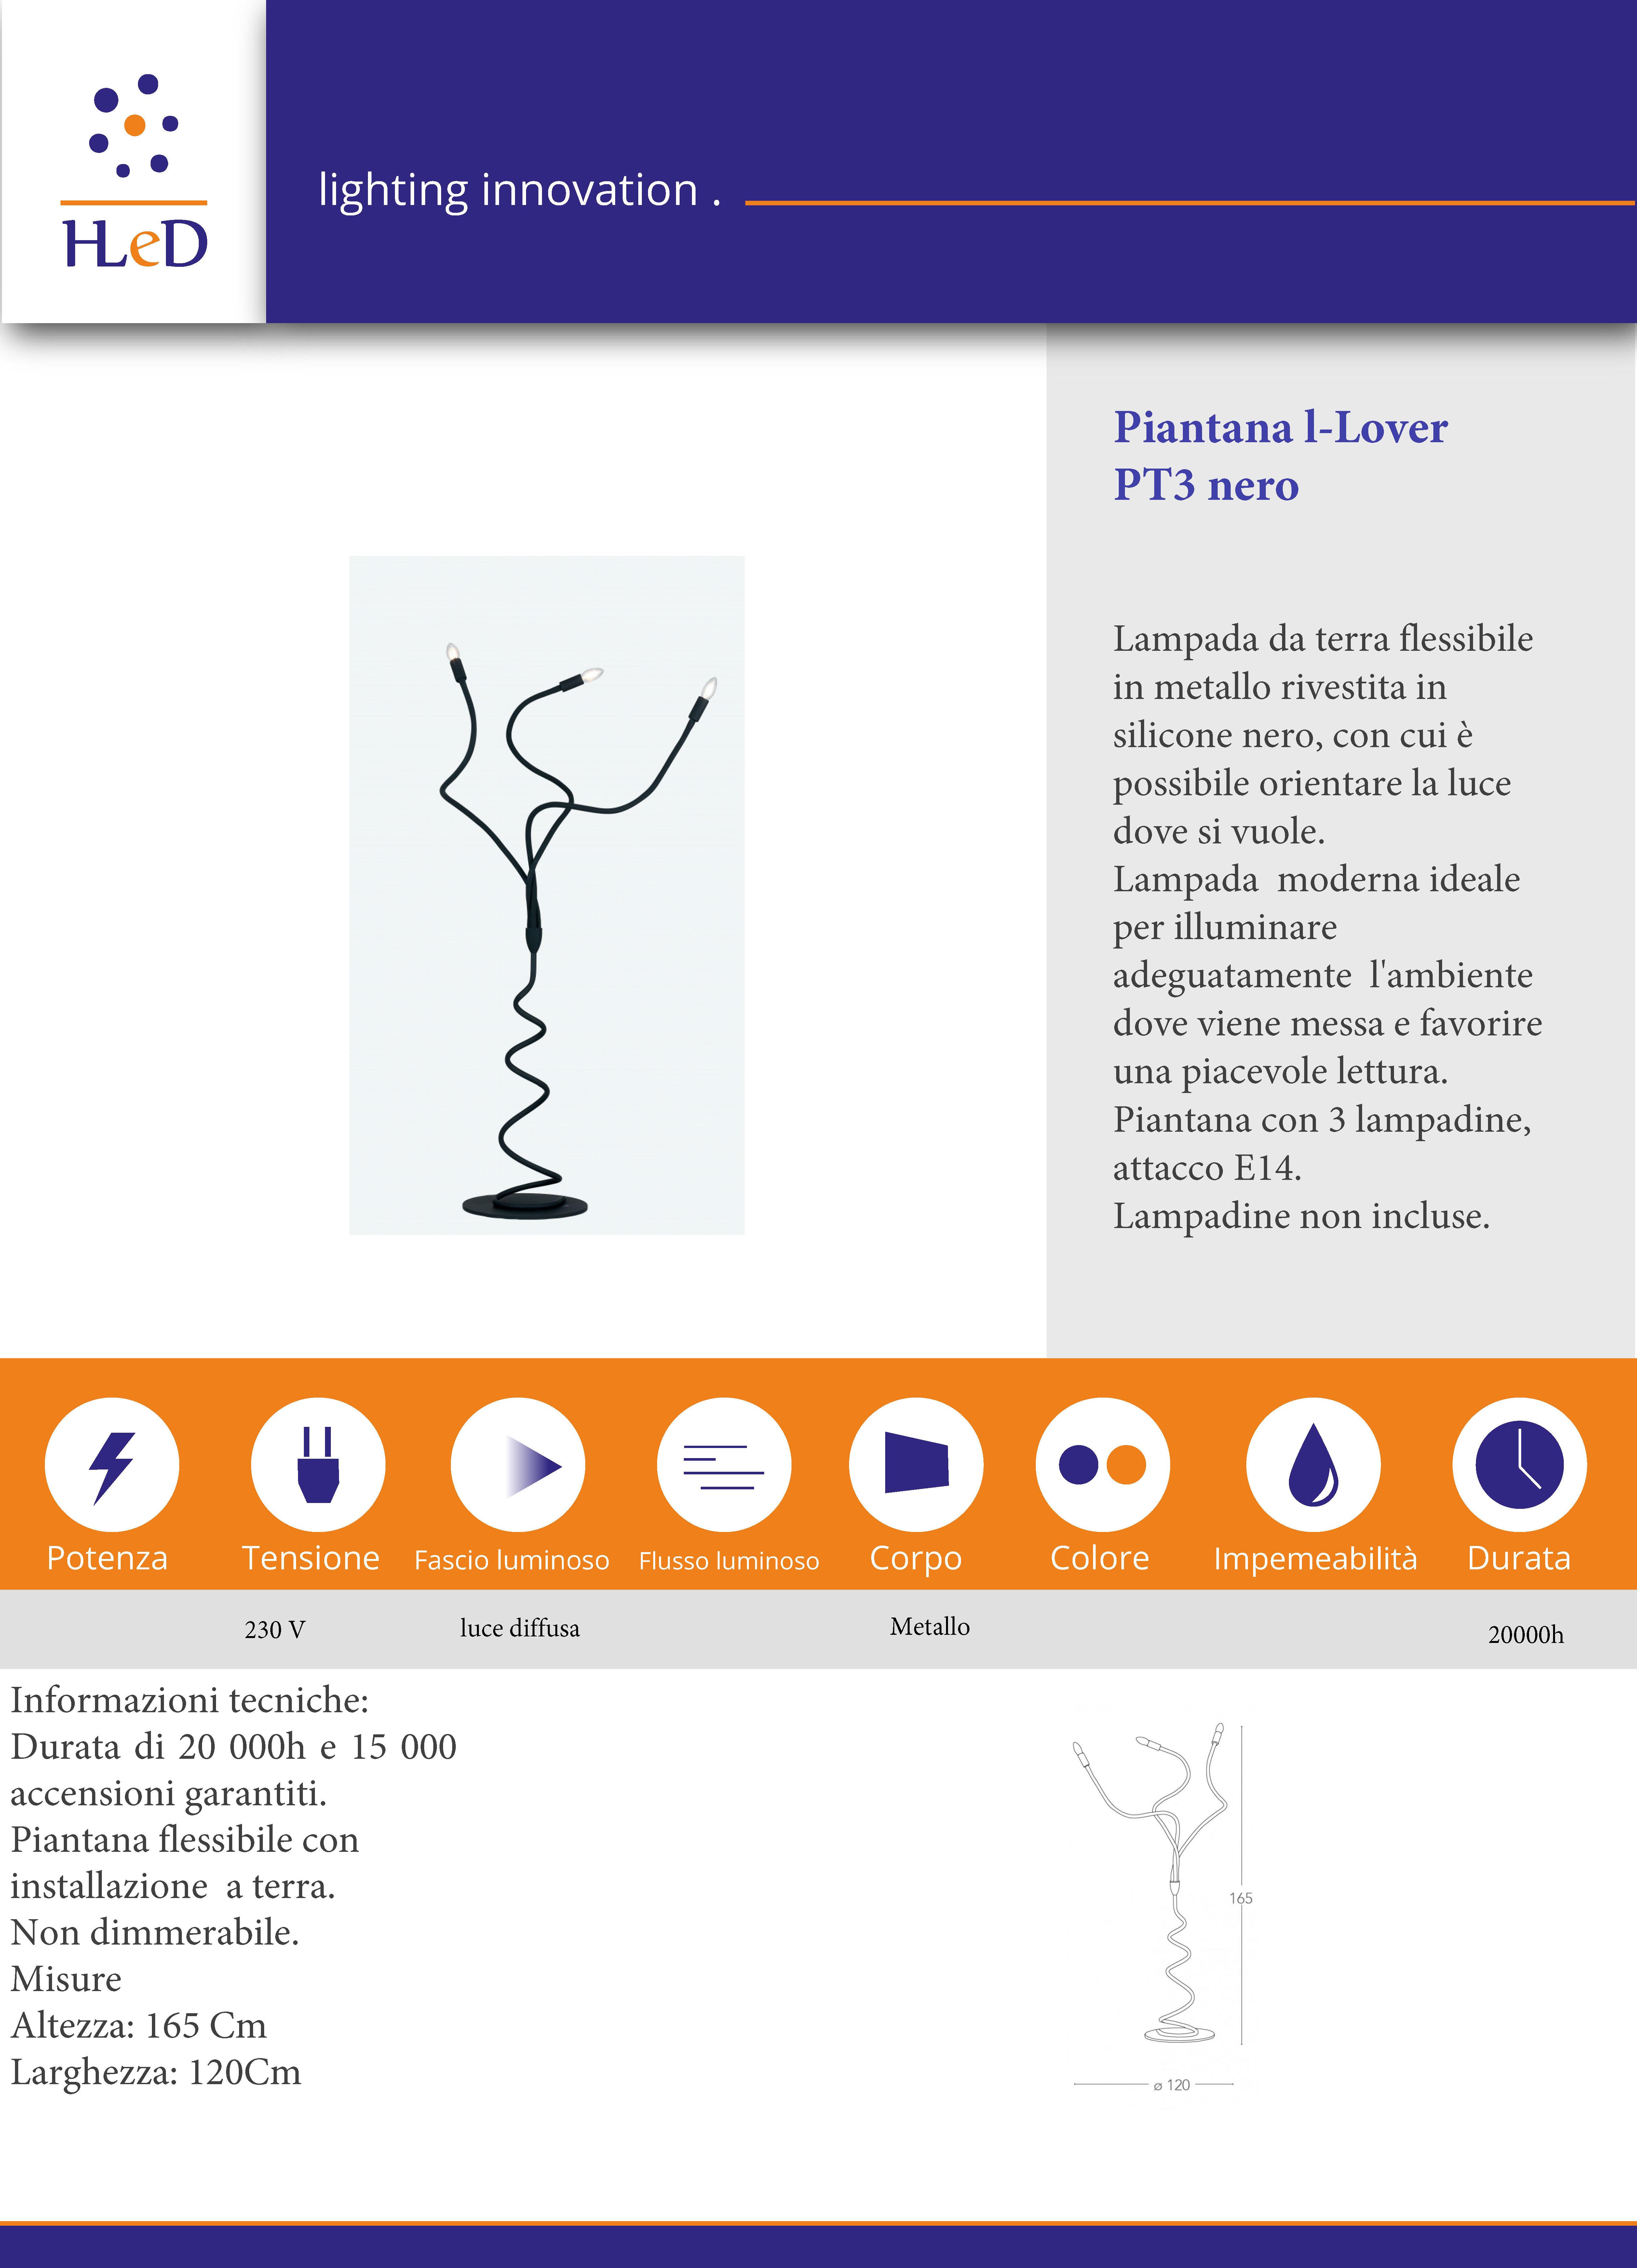 I-LOVER PT3 NERO